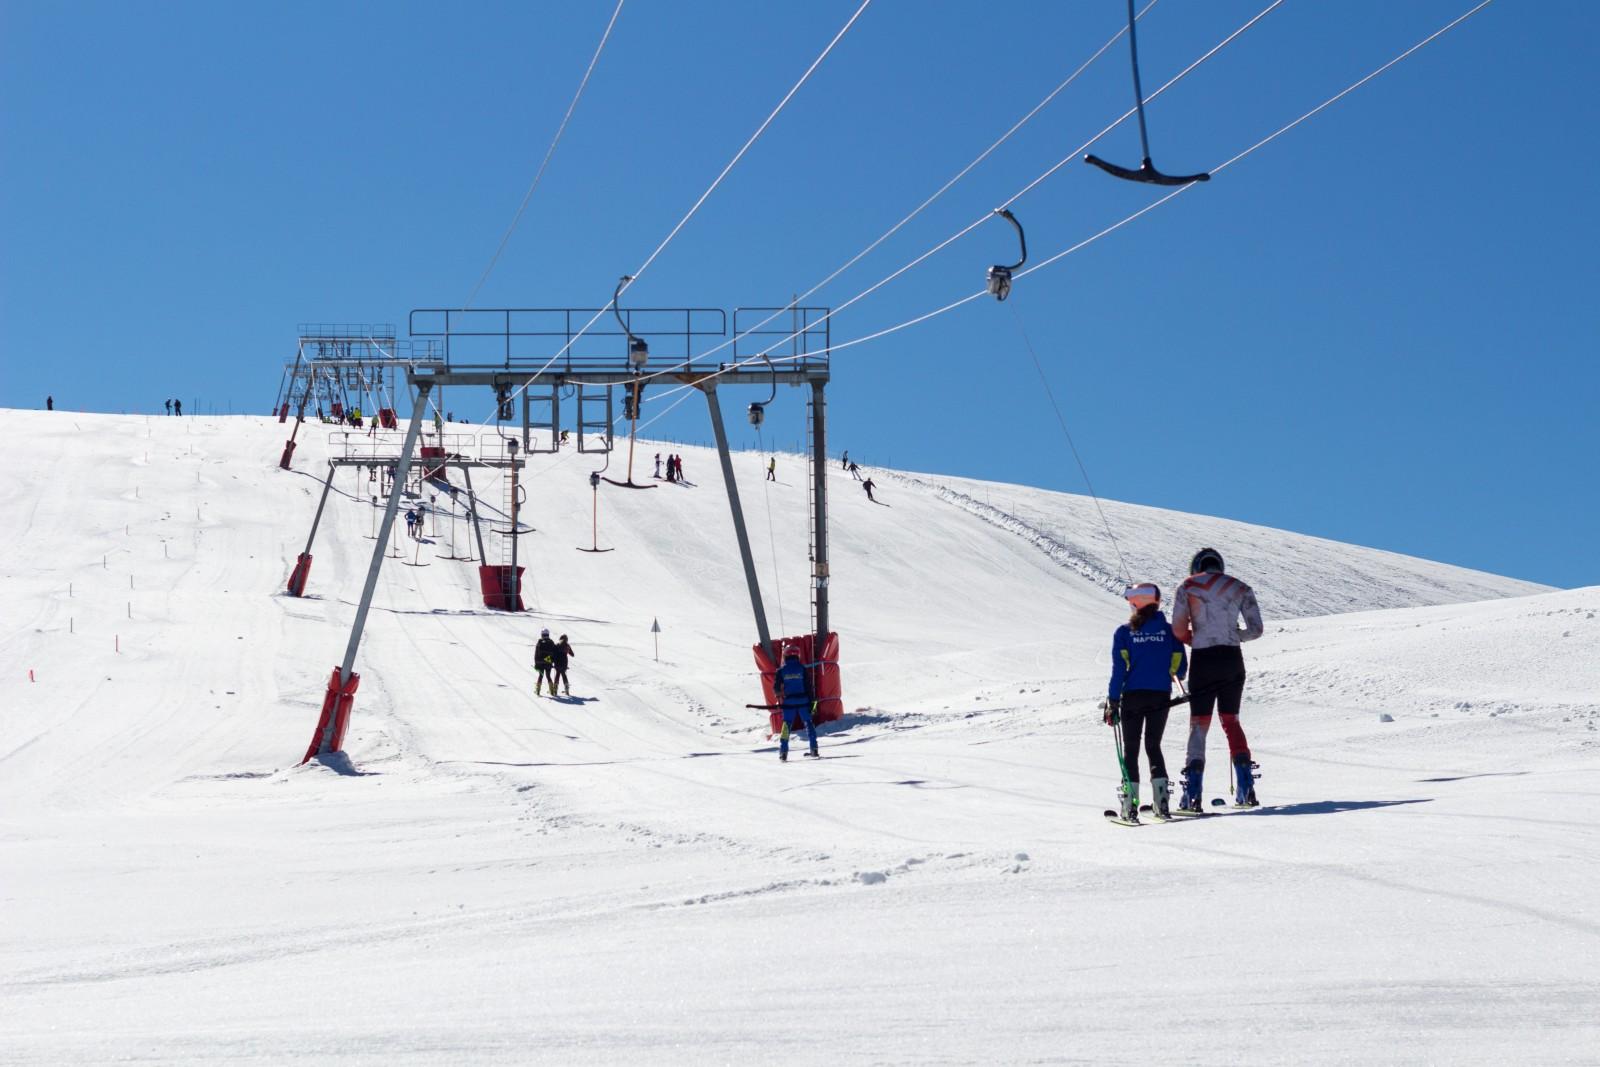 skier les 2 alpes